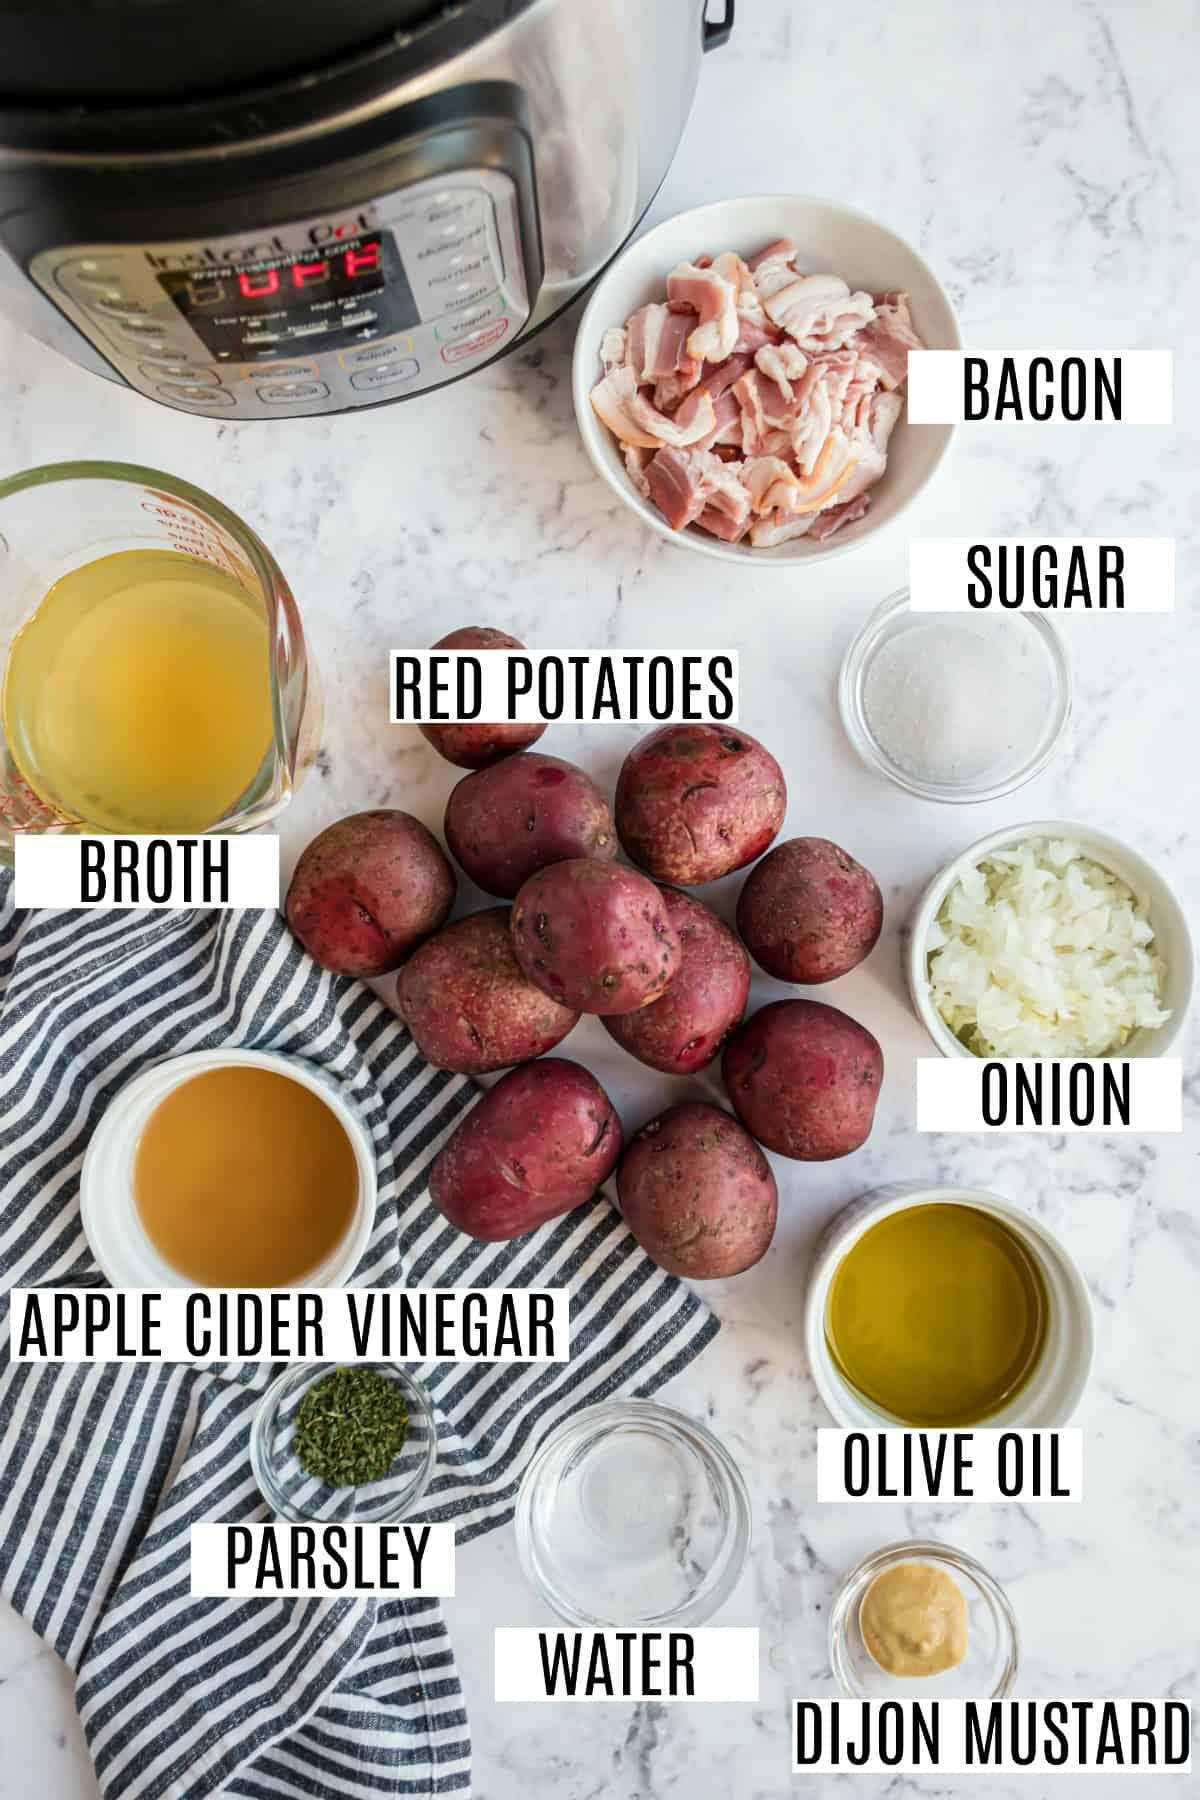 German potato salad ingredients including red potatoes, vinegar, and dijon mustard.